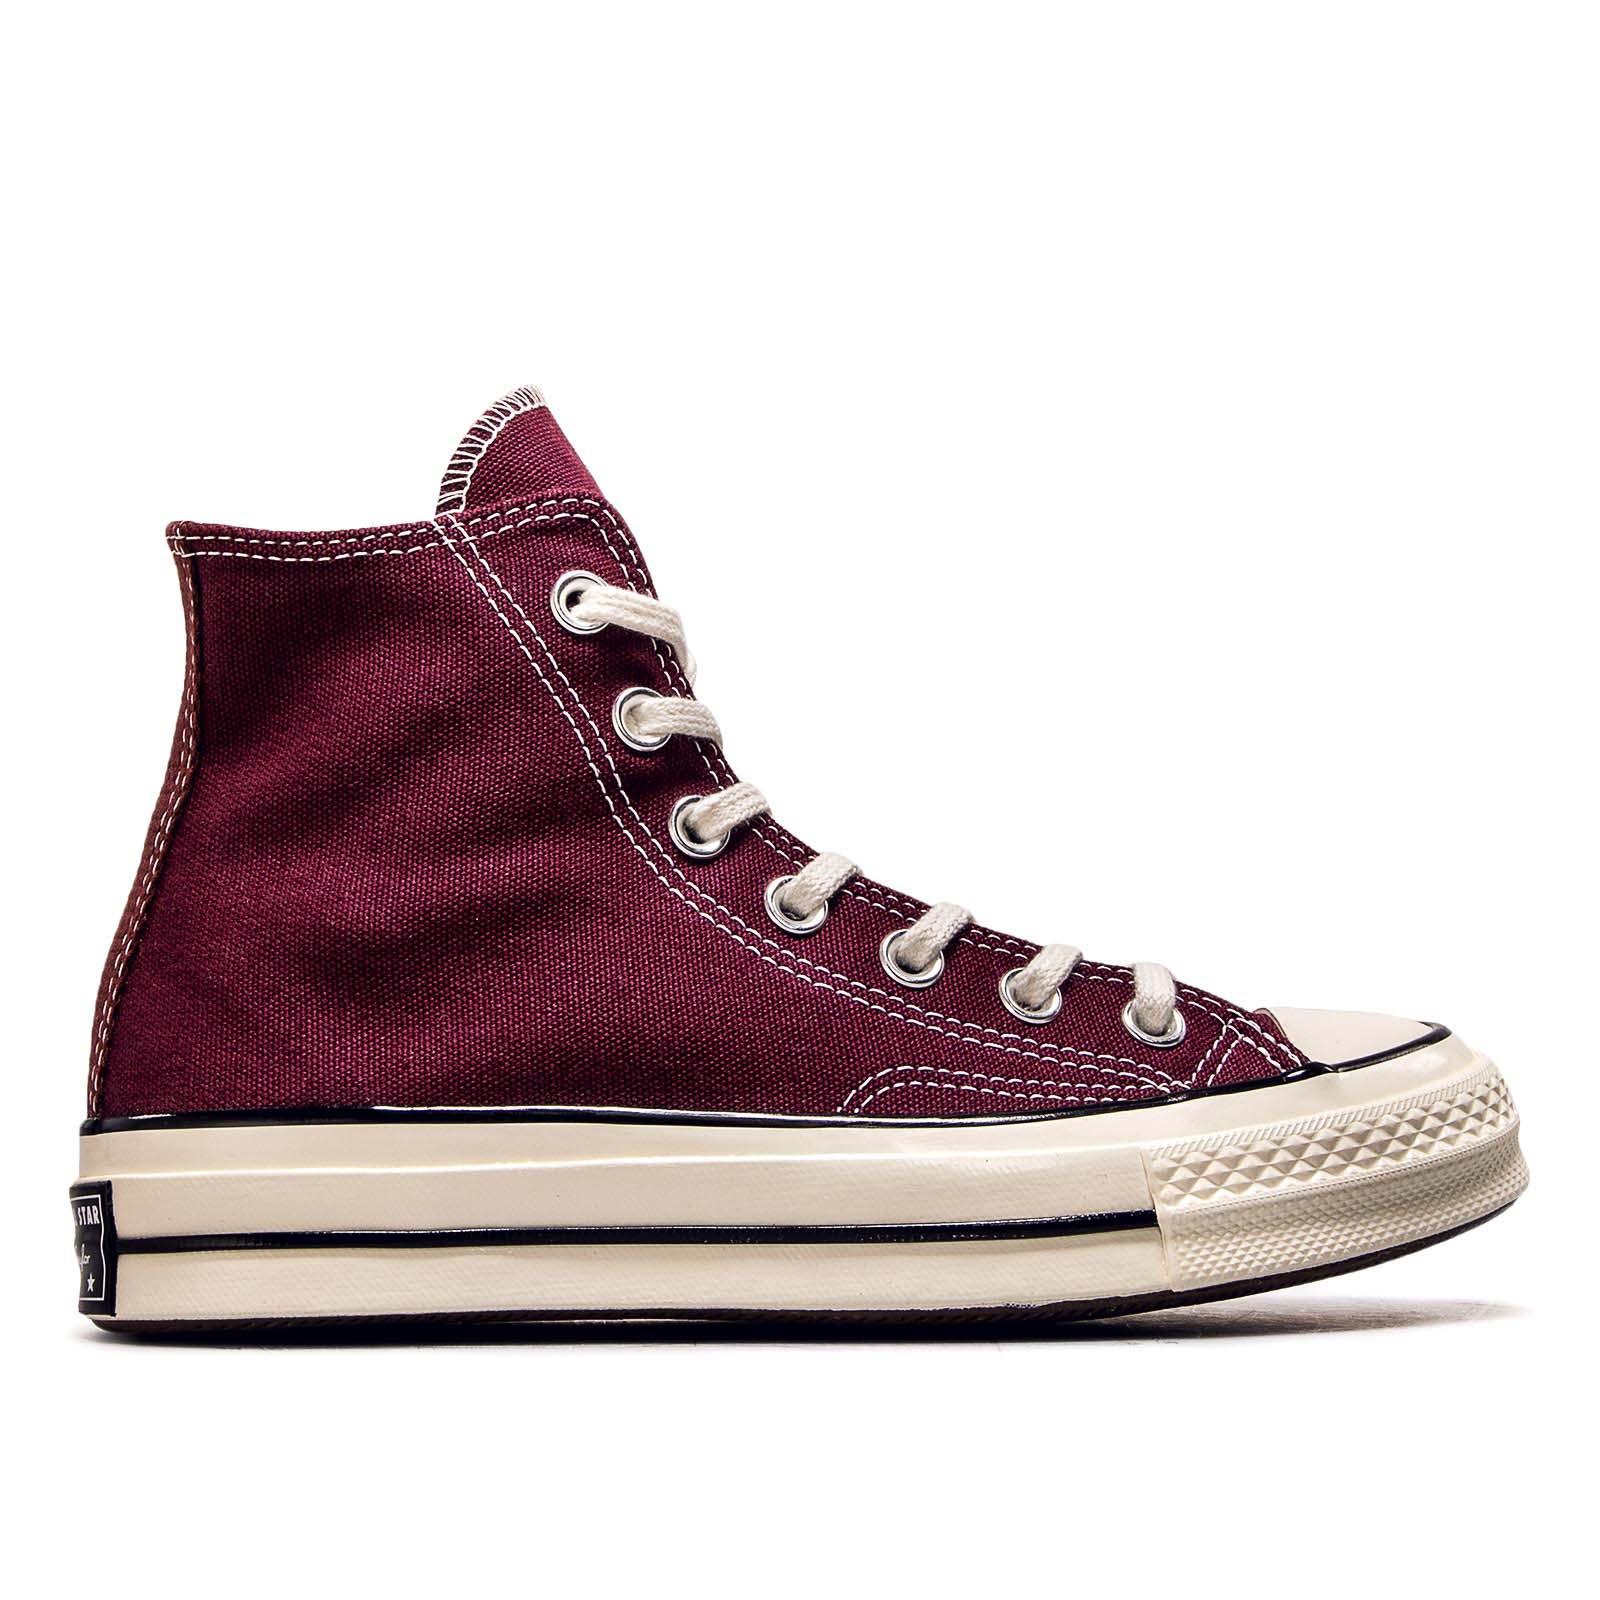 separation shoes 978a7 b68fb Unisex Chuck 70 Hi Dark Burgundy